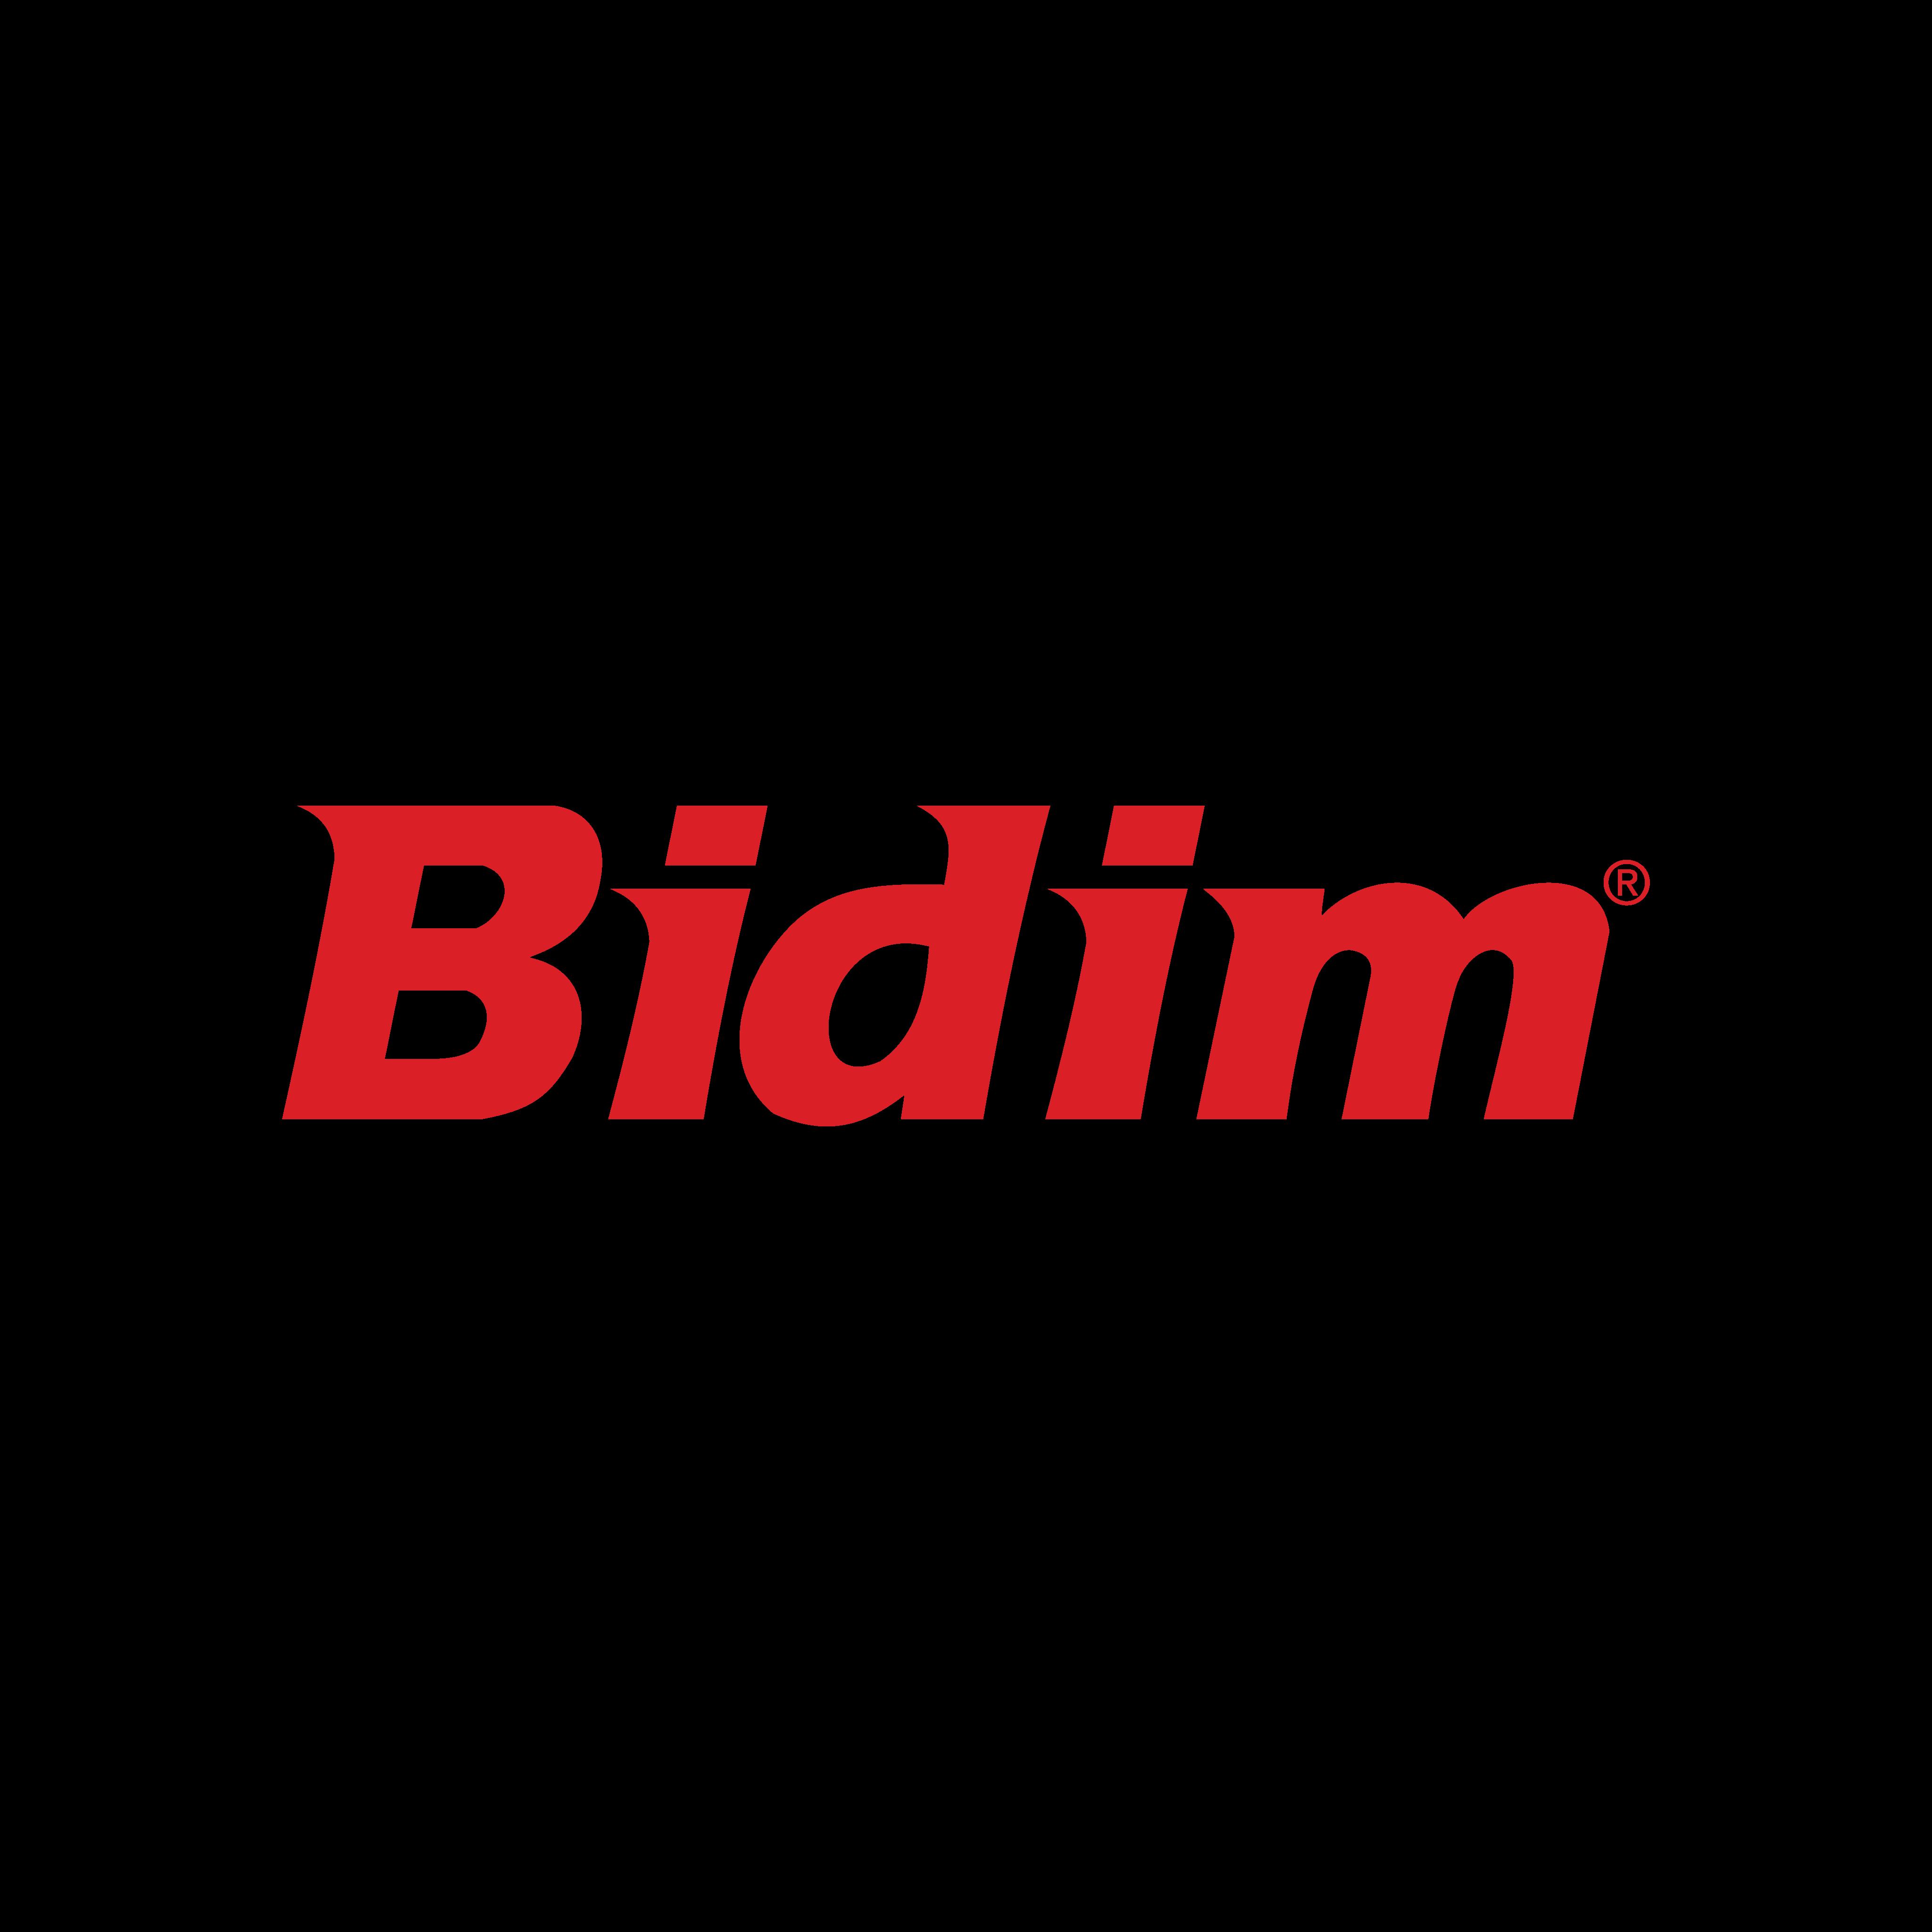 bidim logo 0 - Bidim Logo